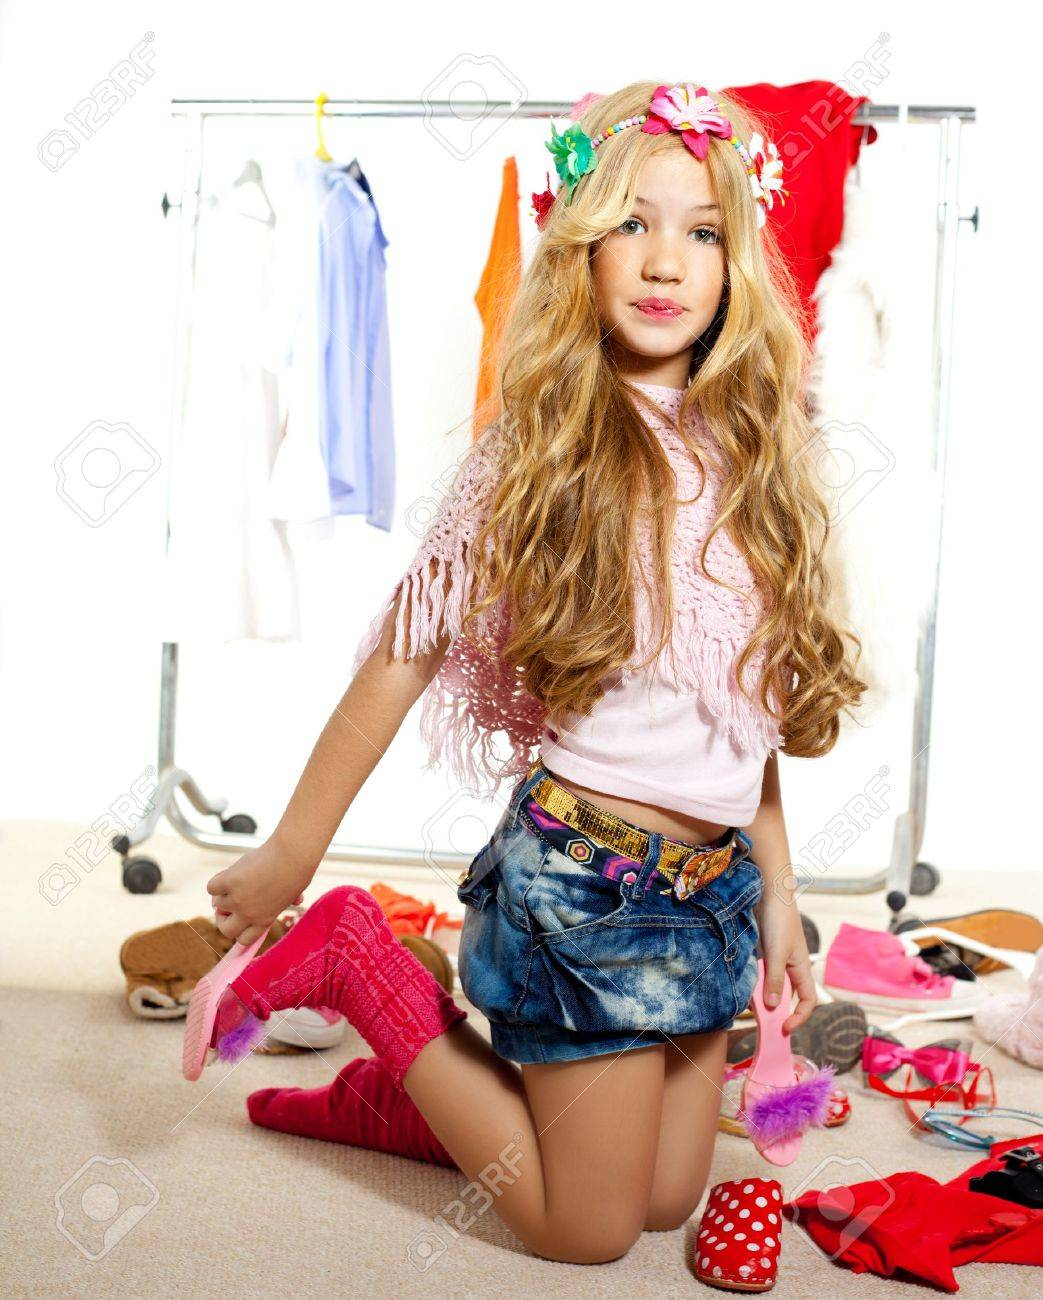 fashion victim kid girl wardrobe messy like backstage model Stock Photo - 12148258